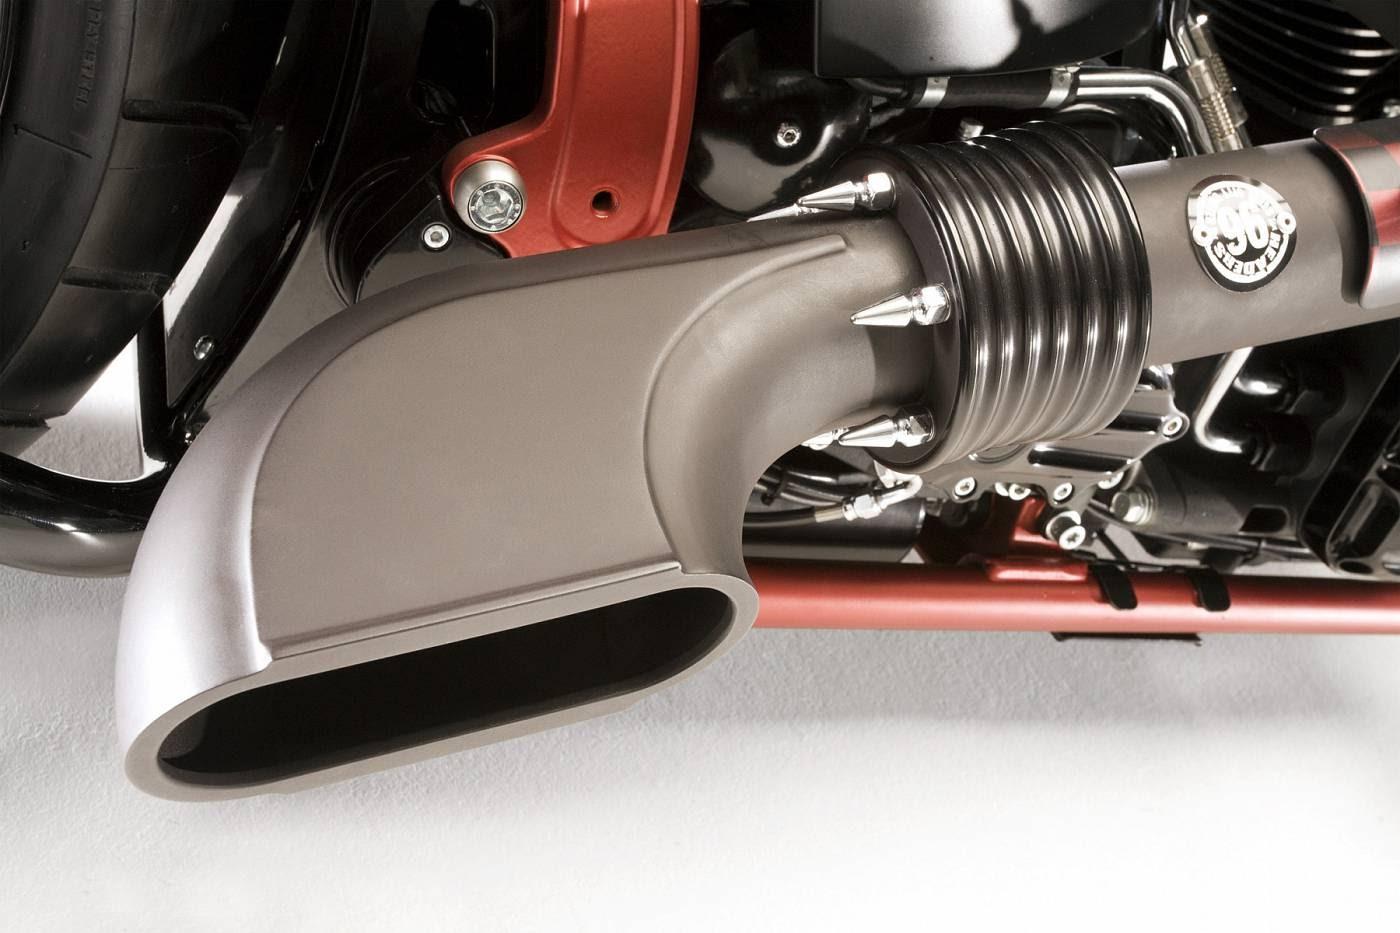 Harley-Davidson Softail Dragstyle by Bundnerbike